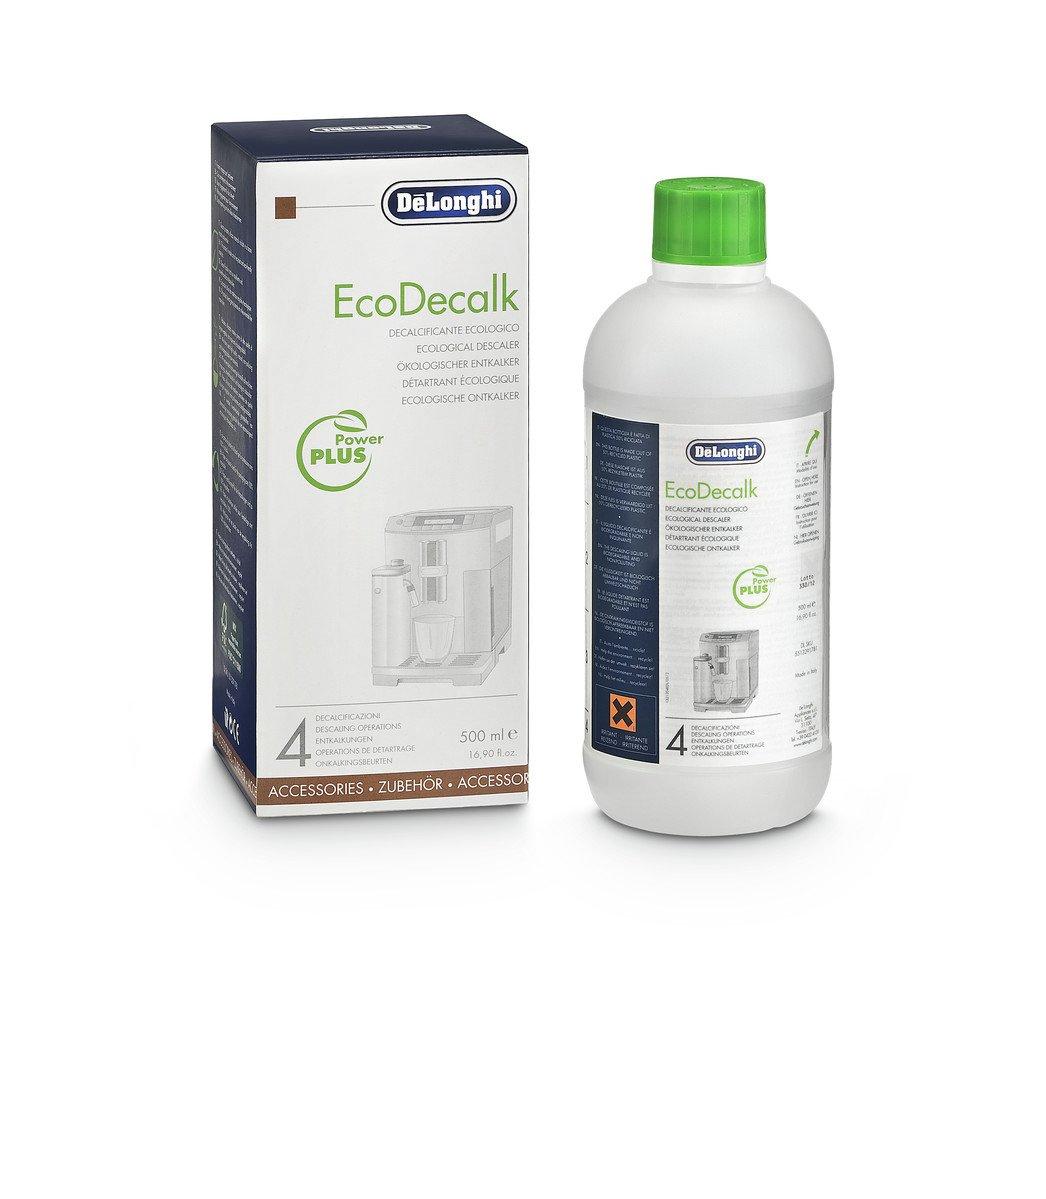 De'Longhi EcoDecalk 500ml Descaler